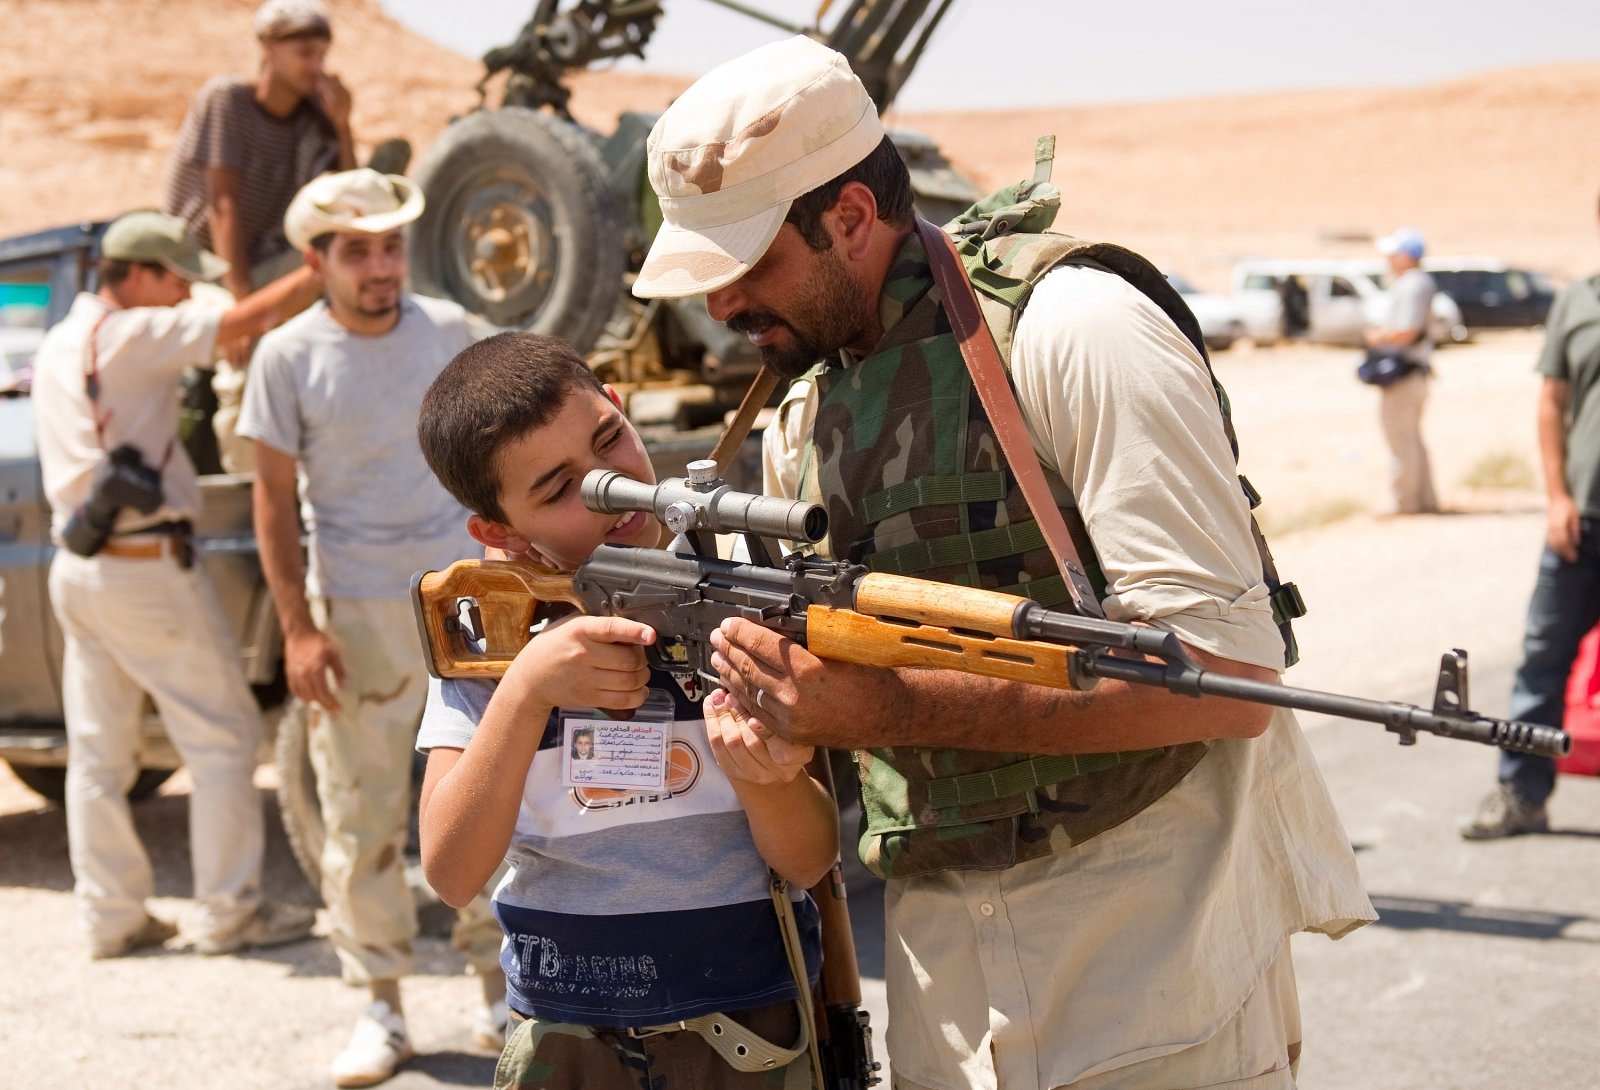 An anti-Gaddafi militant allows a boy to look through the telescopic target of his rifle near Beni Malid in 2011. (Getty)